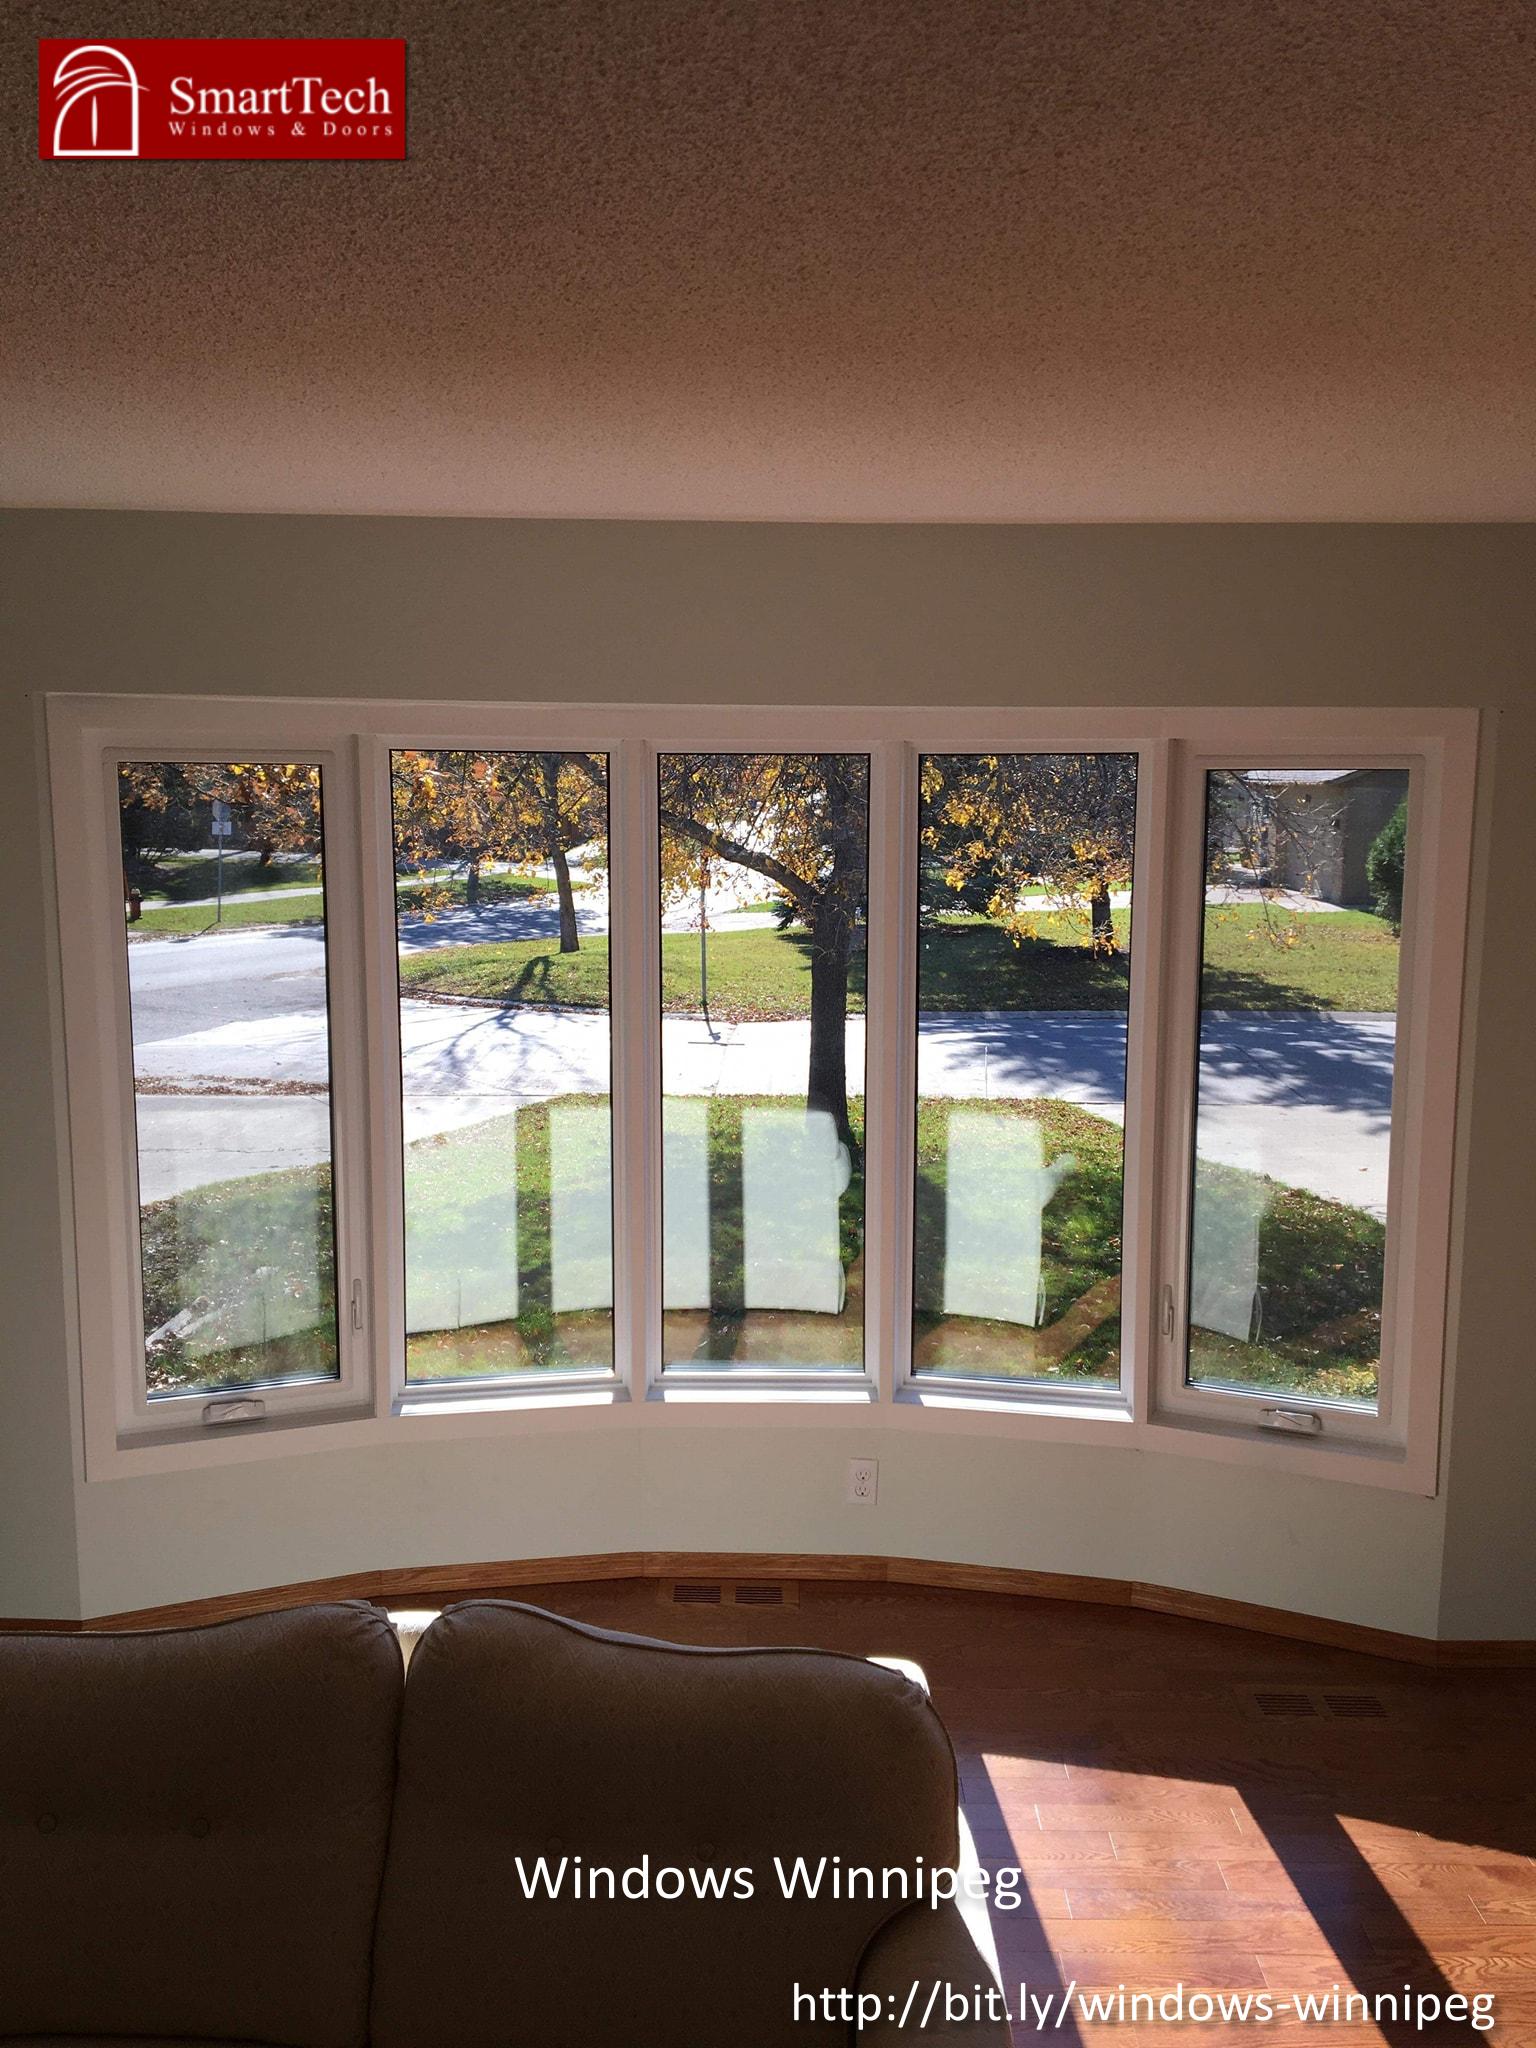 SmartTech Windows and Doors Winnipeg Launches Winnipeg Window Installation